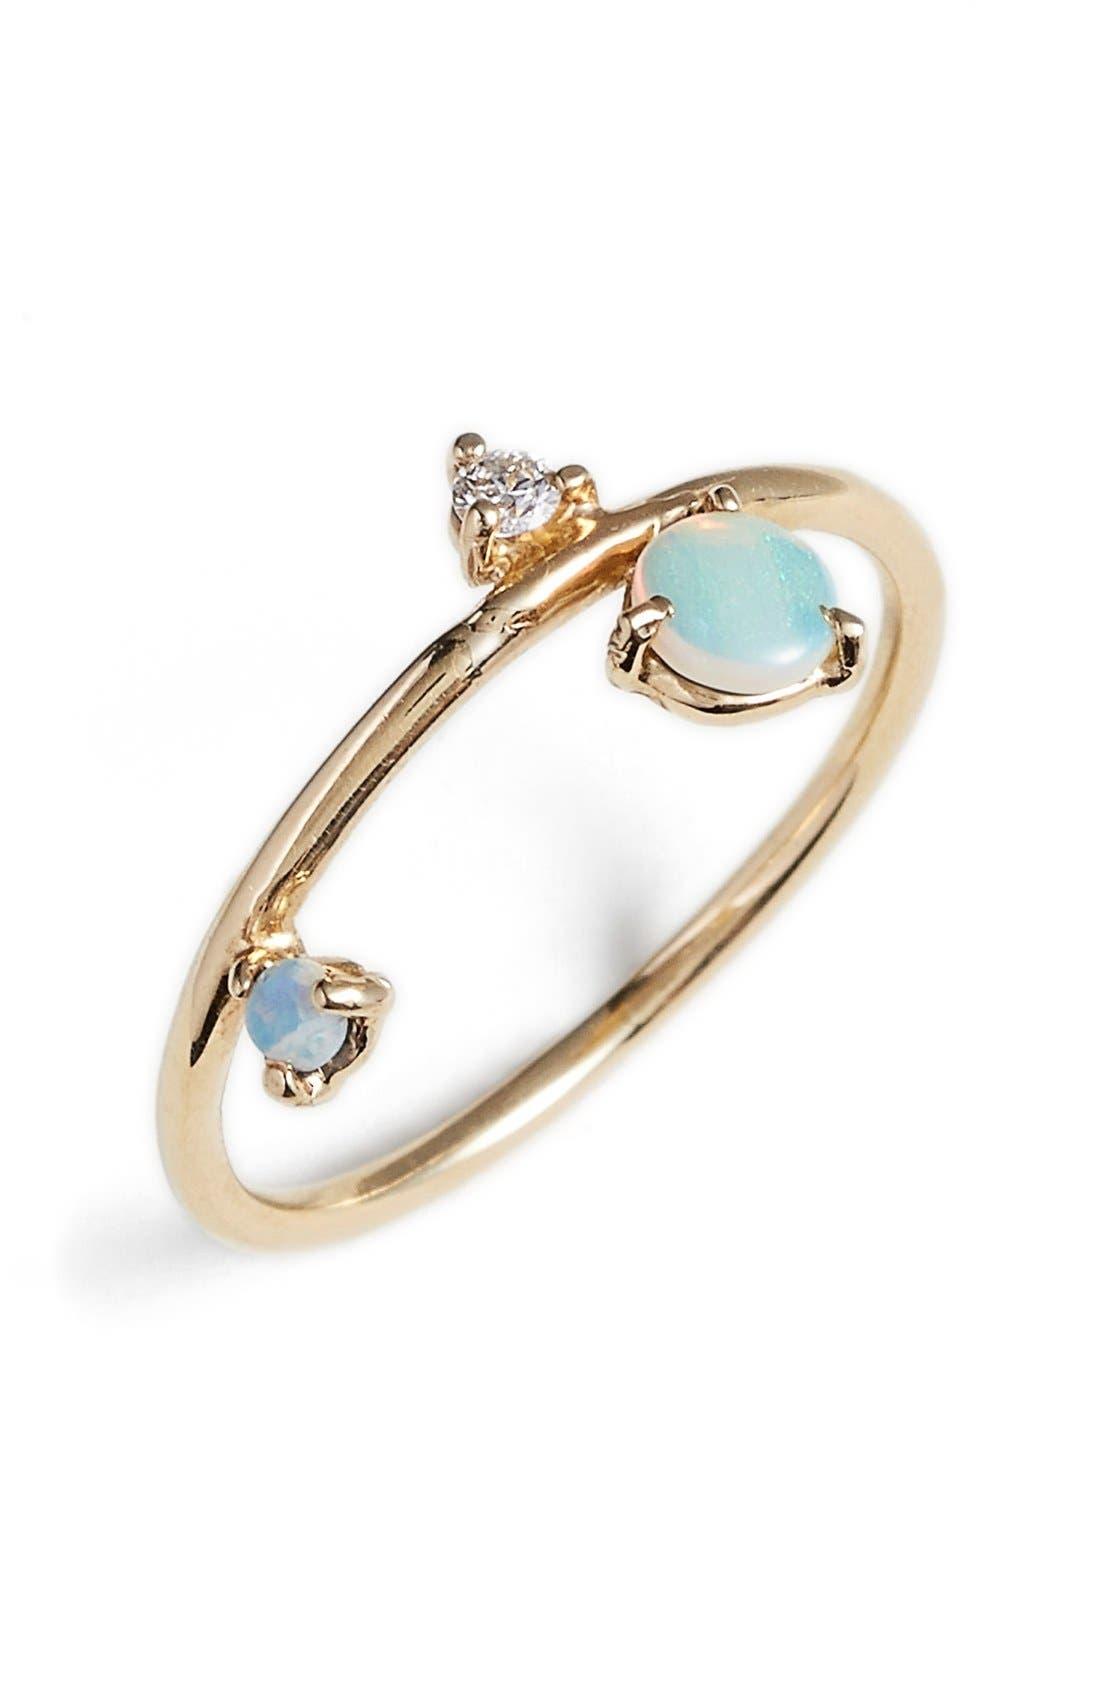 Main Image - WWAKE Counting Collection Three-Step Balloon Opal & Diamond Ring